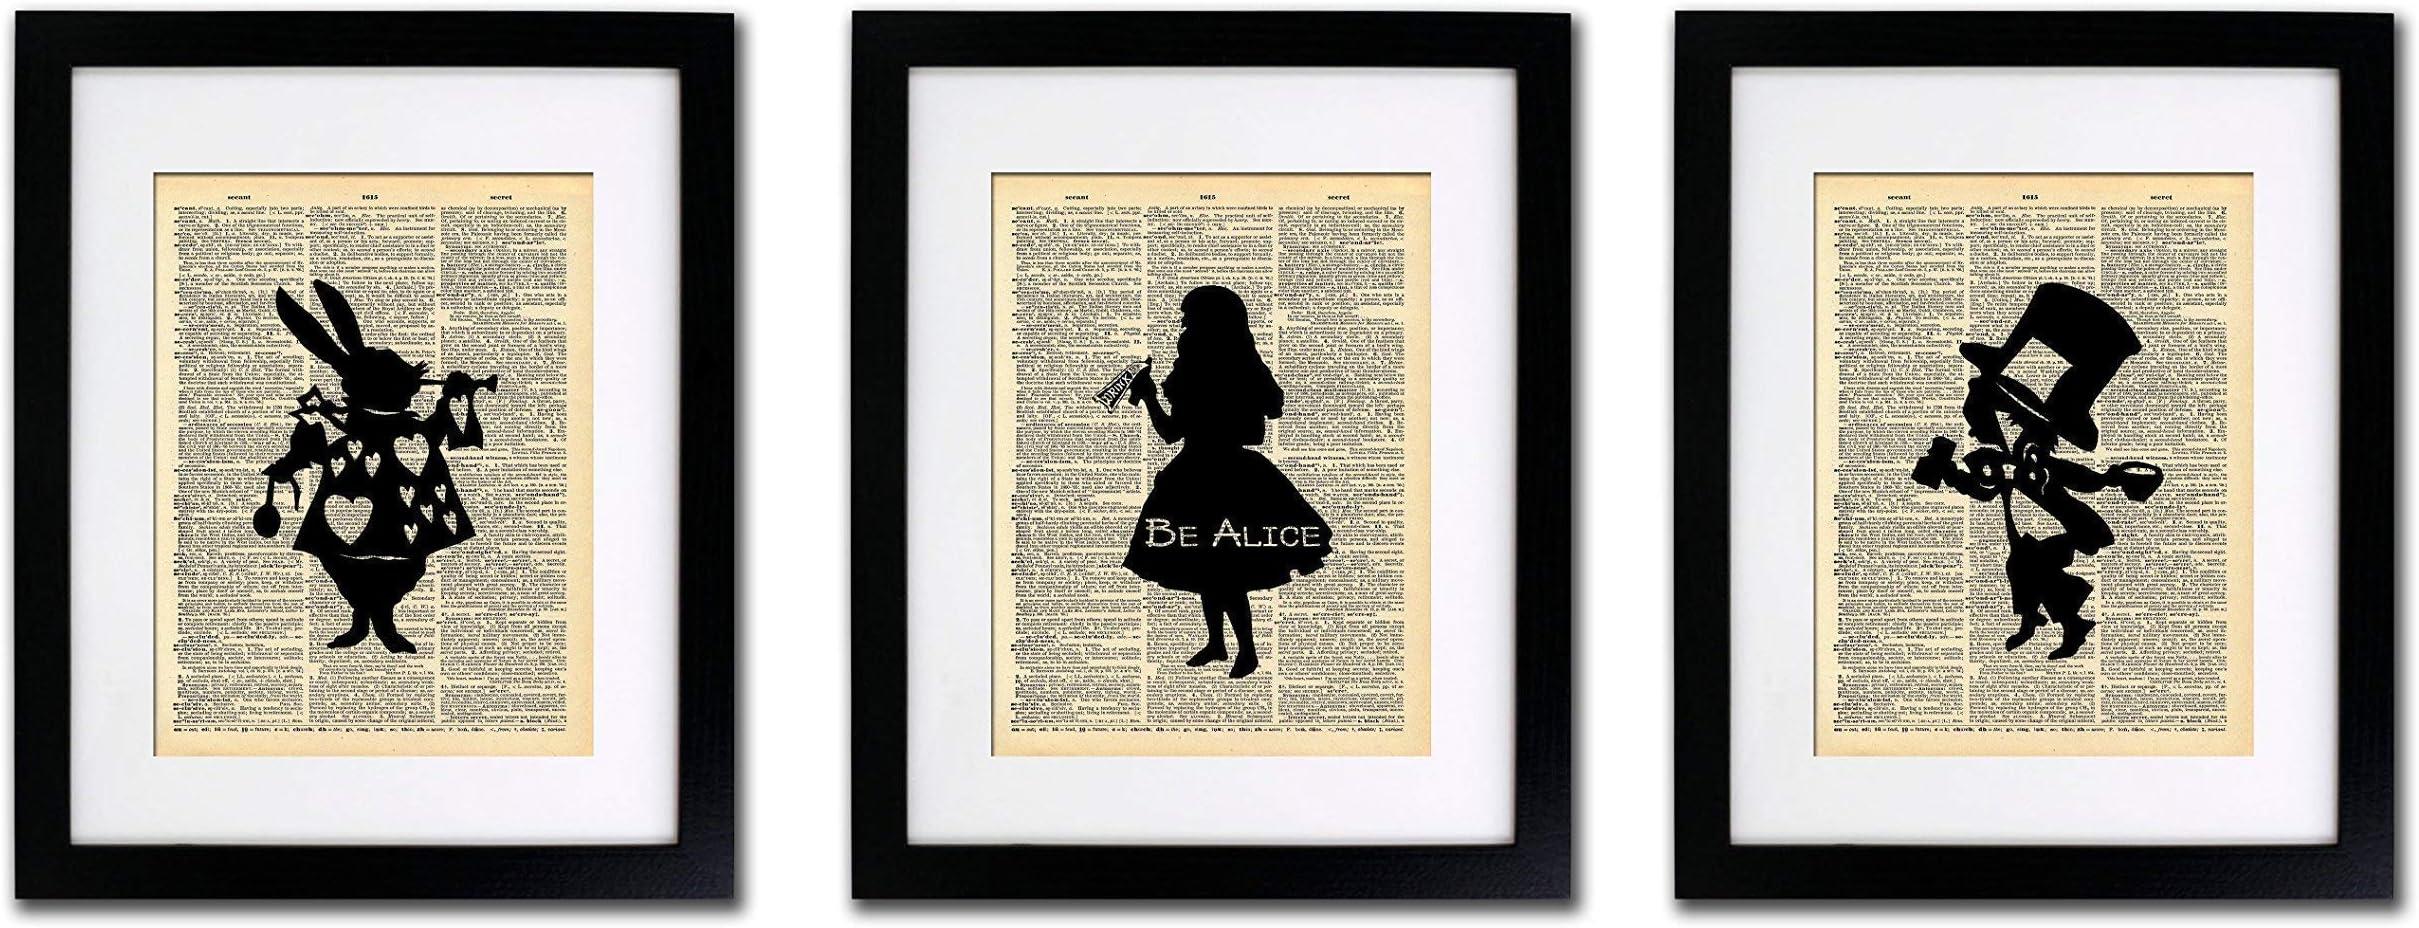 Alice Wall Decor Alice Gift Set Alice in Wonderland Print ALICE Print Set of 4 Alice Best Friend Gift 079 Alice Quotes Wall Art Prints